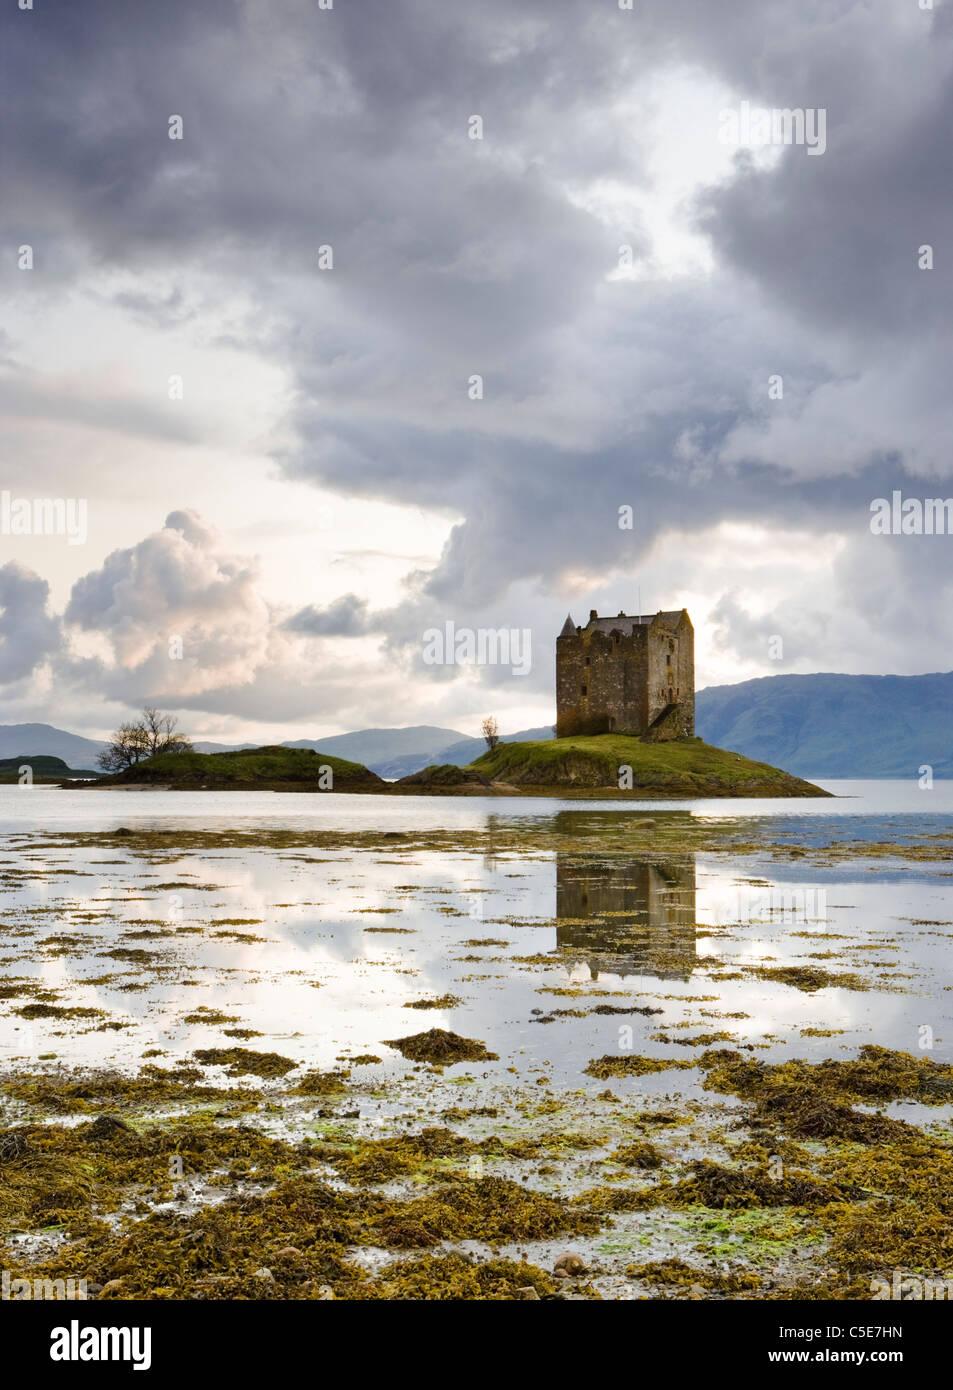 Castle Stalker, Argyll, Scotland, UK - Stock Image